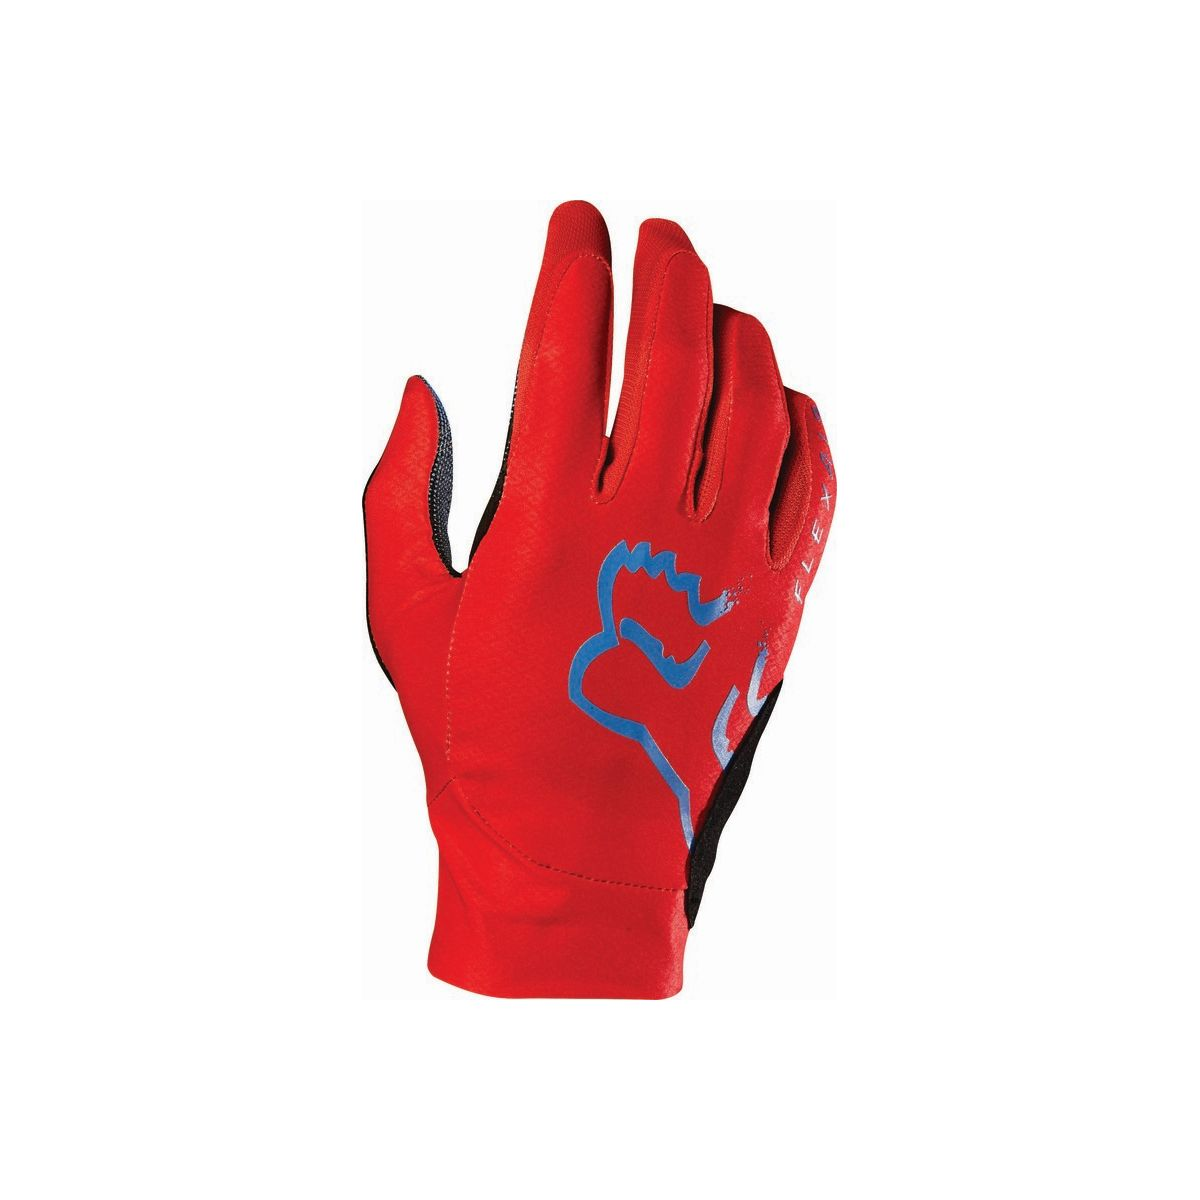 Rękawiczki Fox Flexair Red / Black